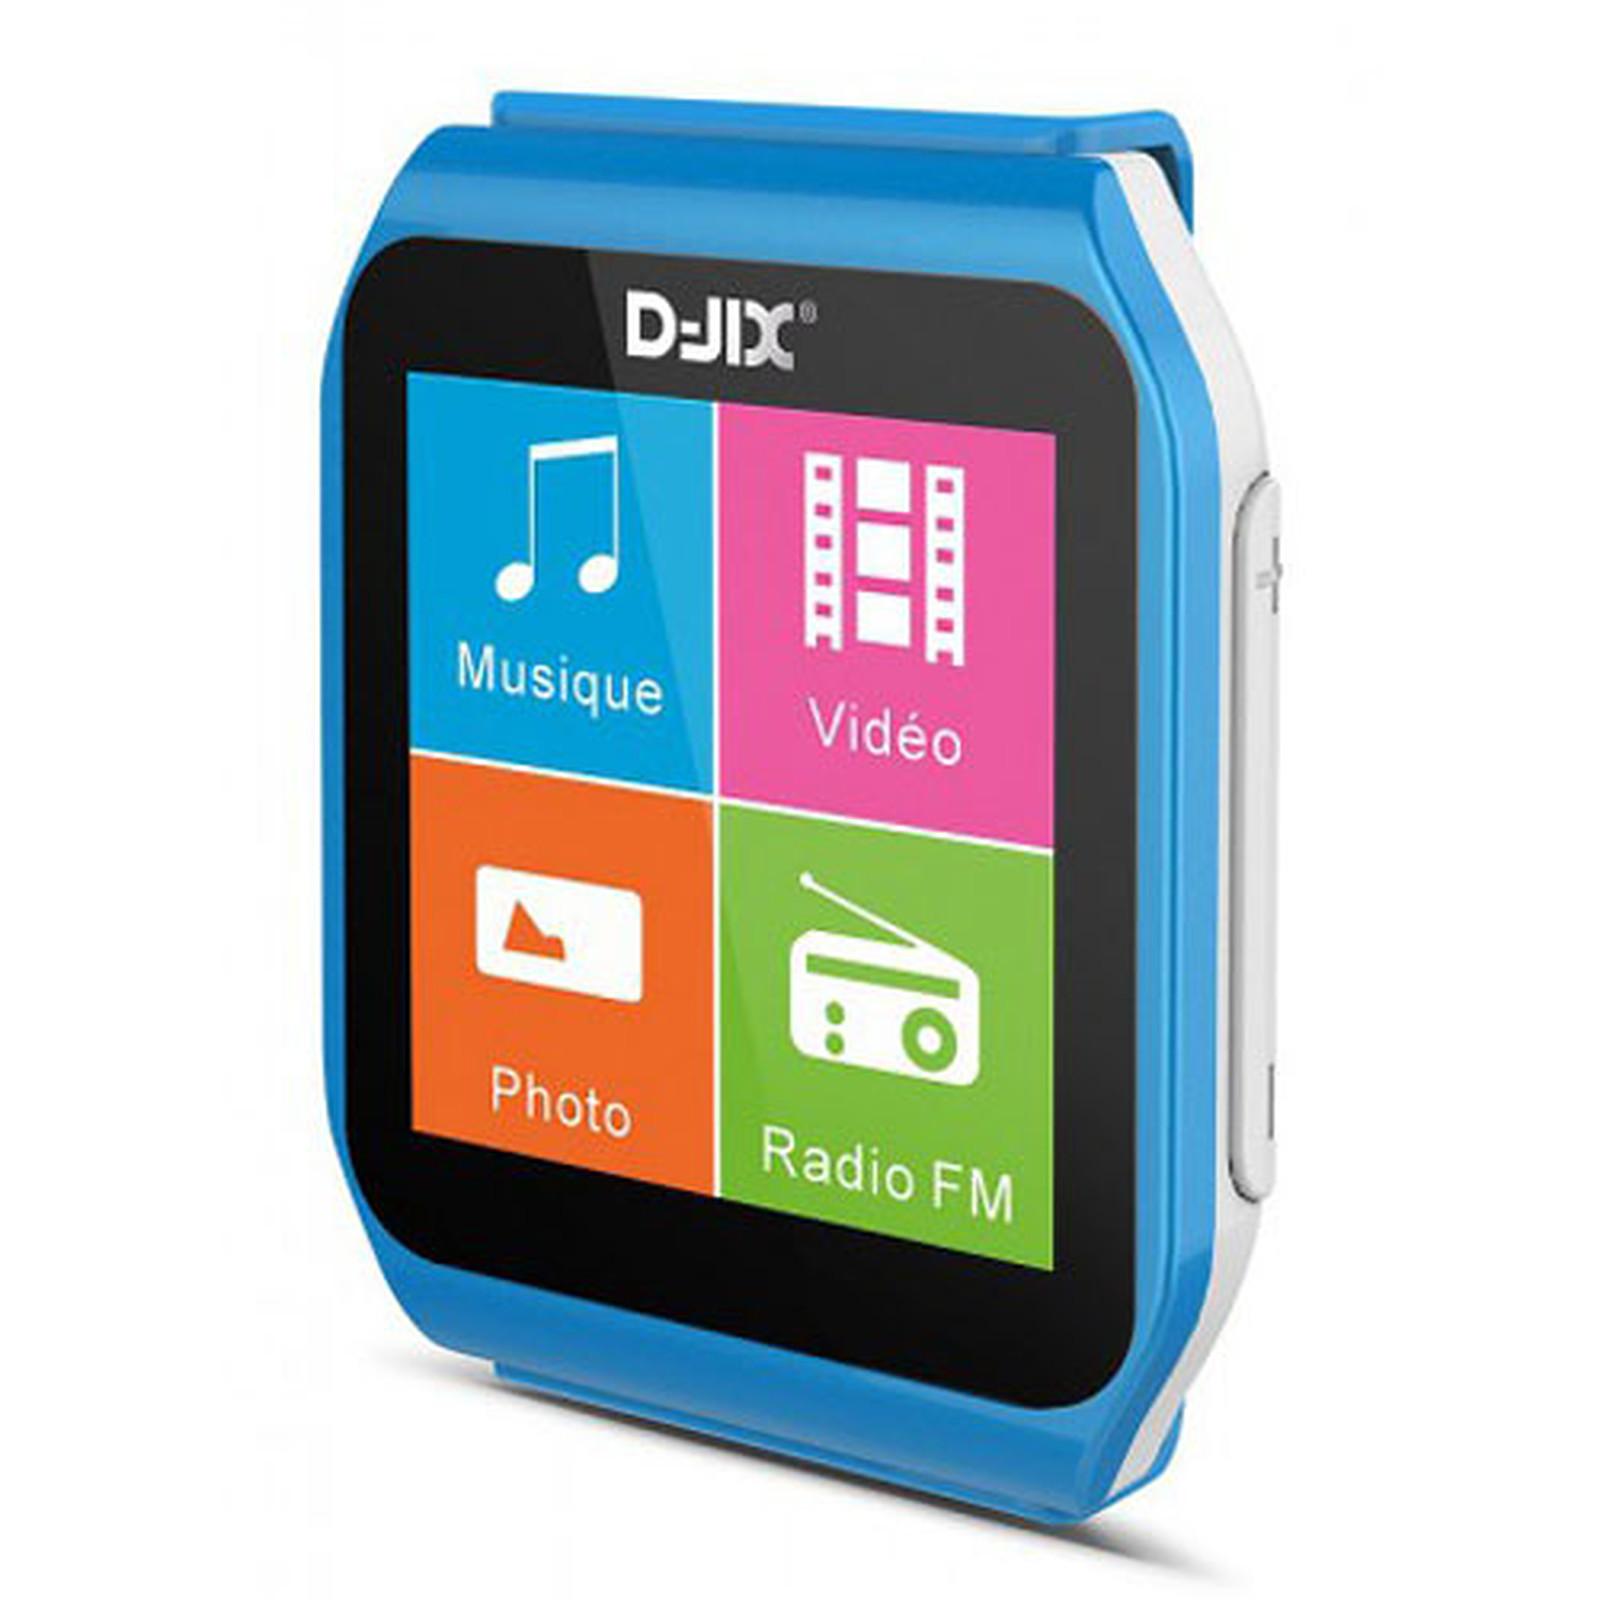 D-Jix D-Watch 2 Turquoise 8 Go